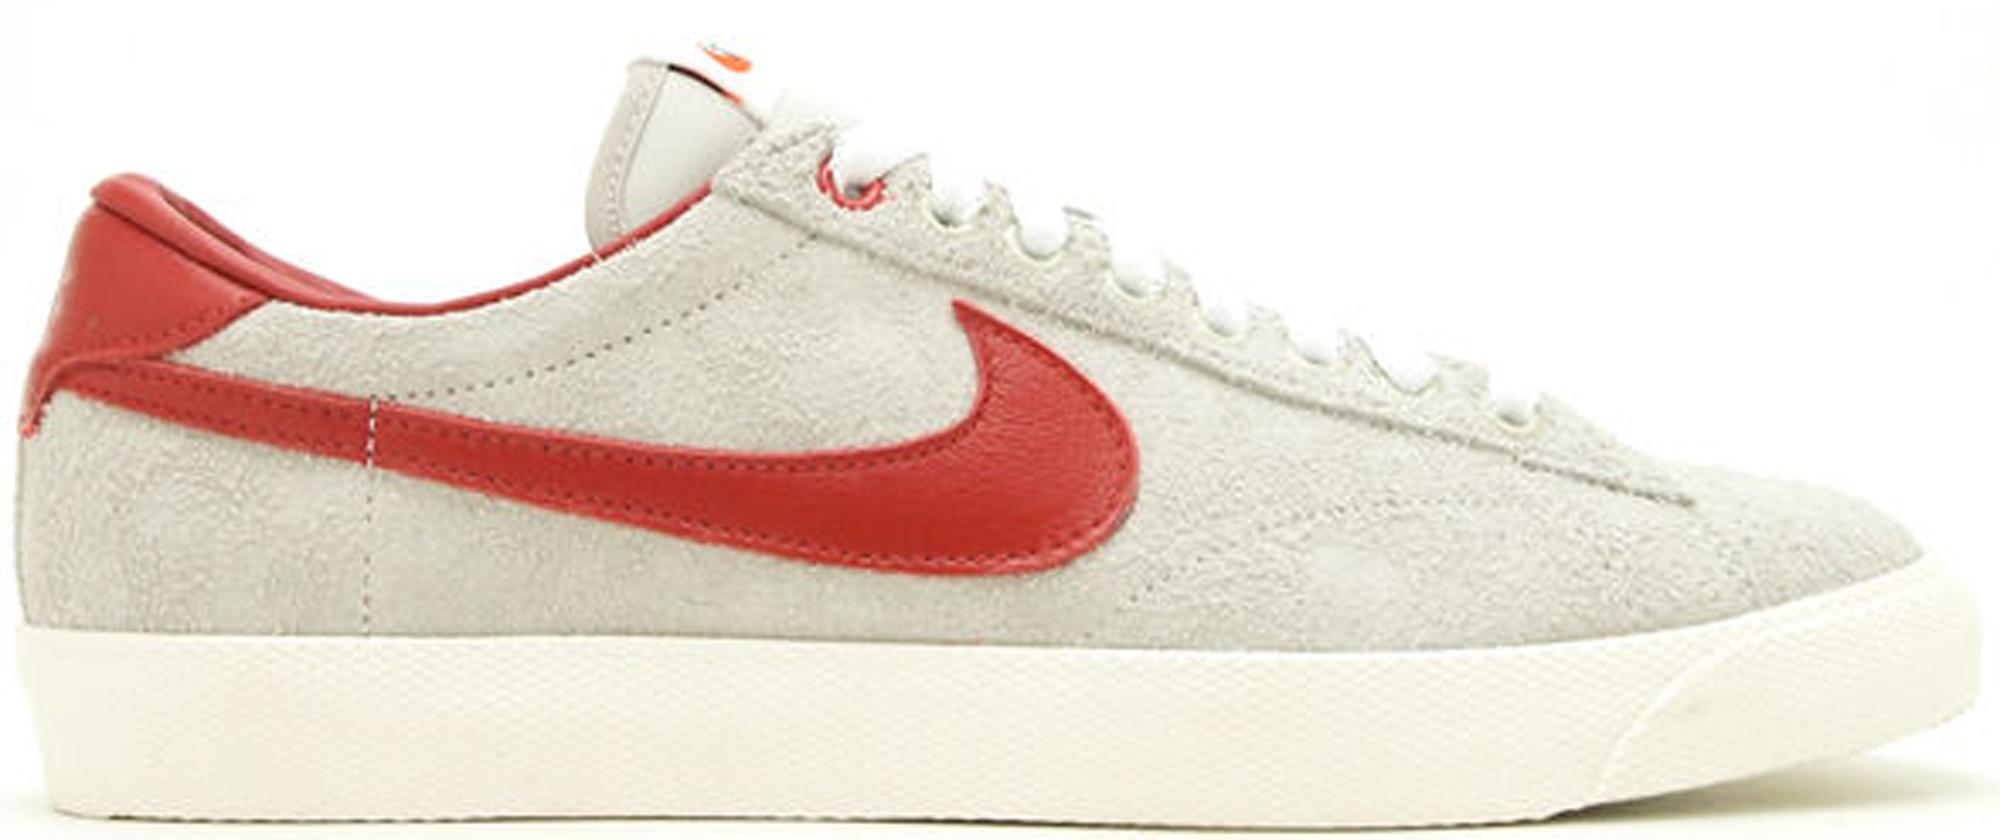 Nike Tennis Classic AC Clot - 515011-001